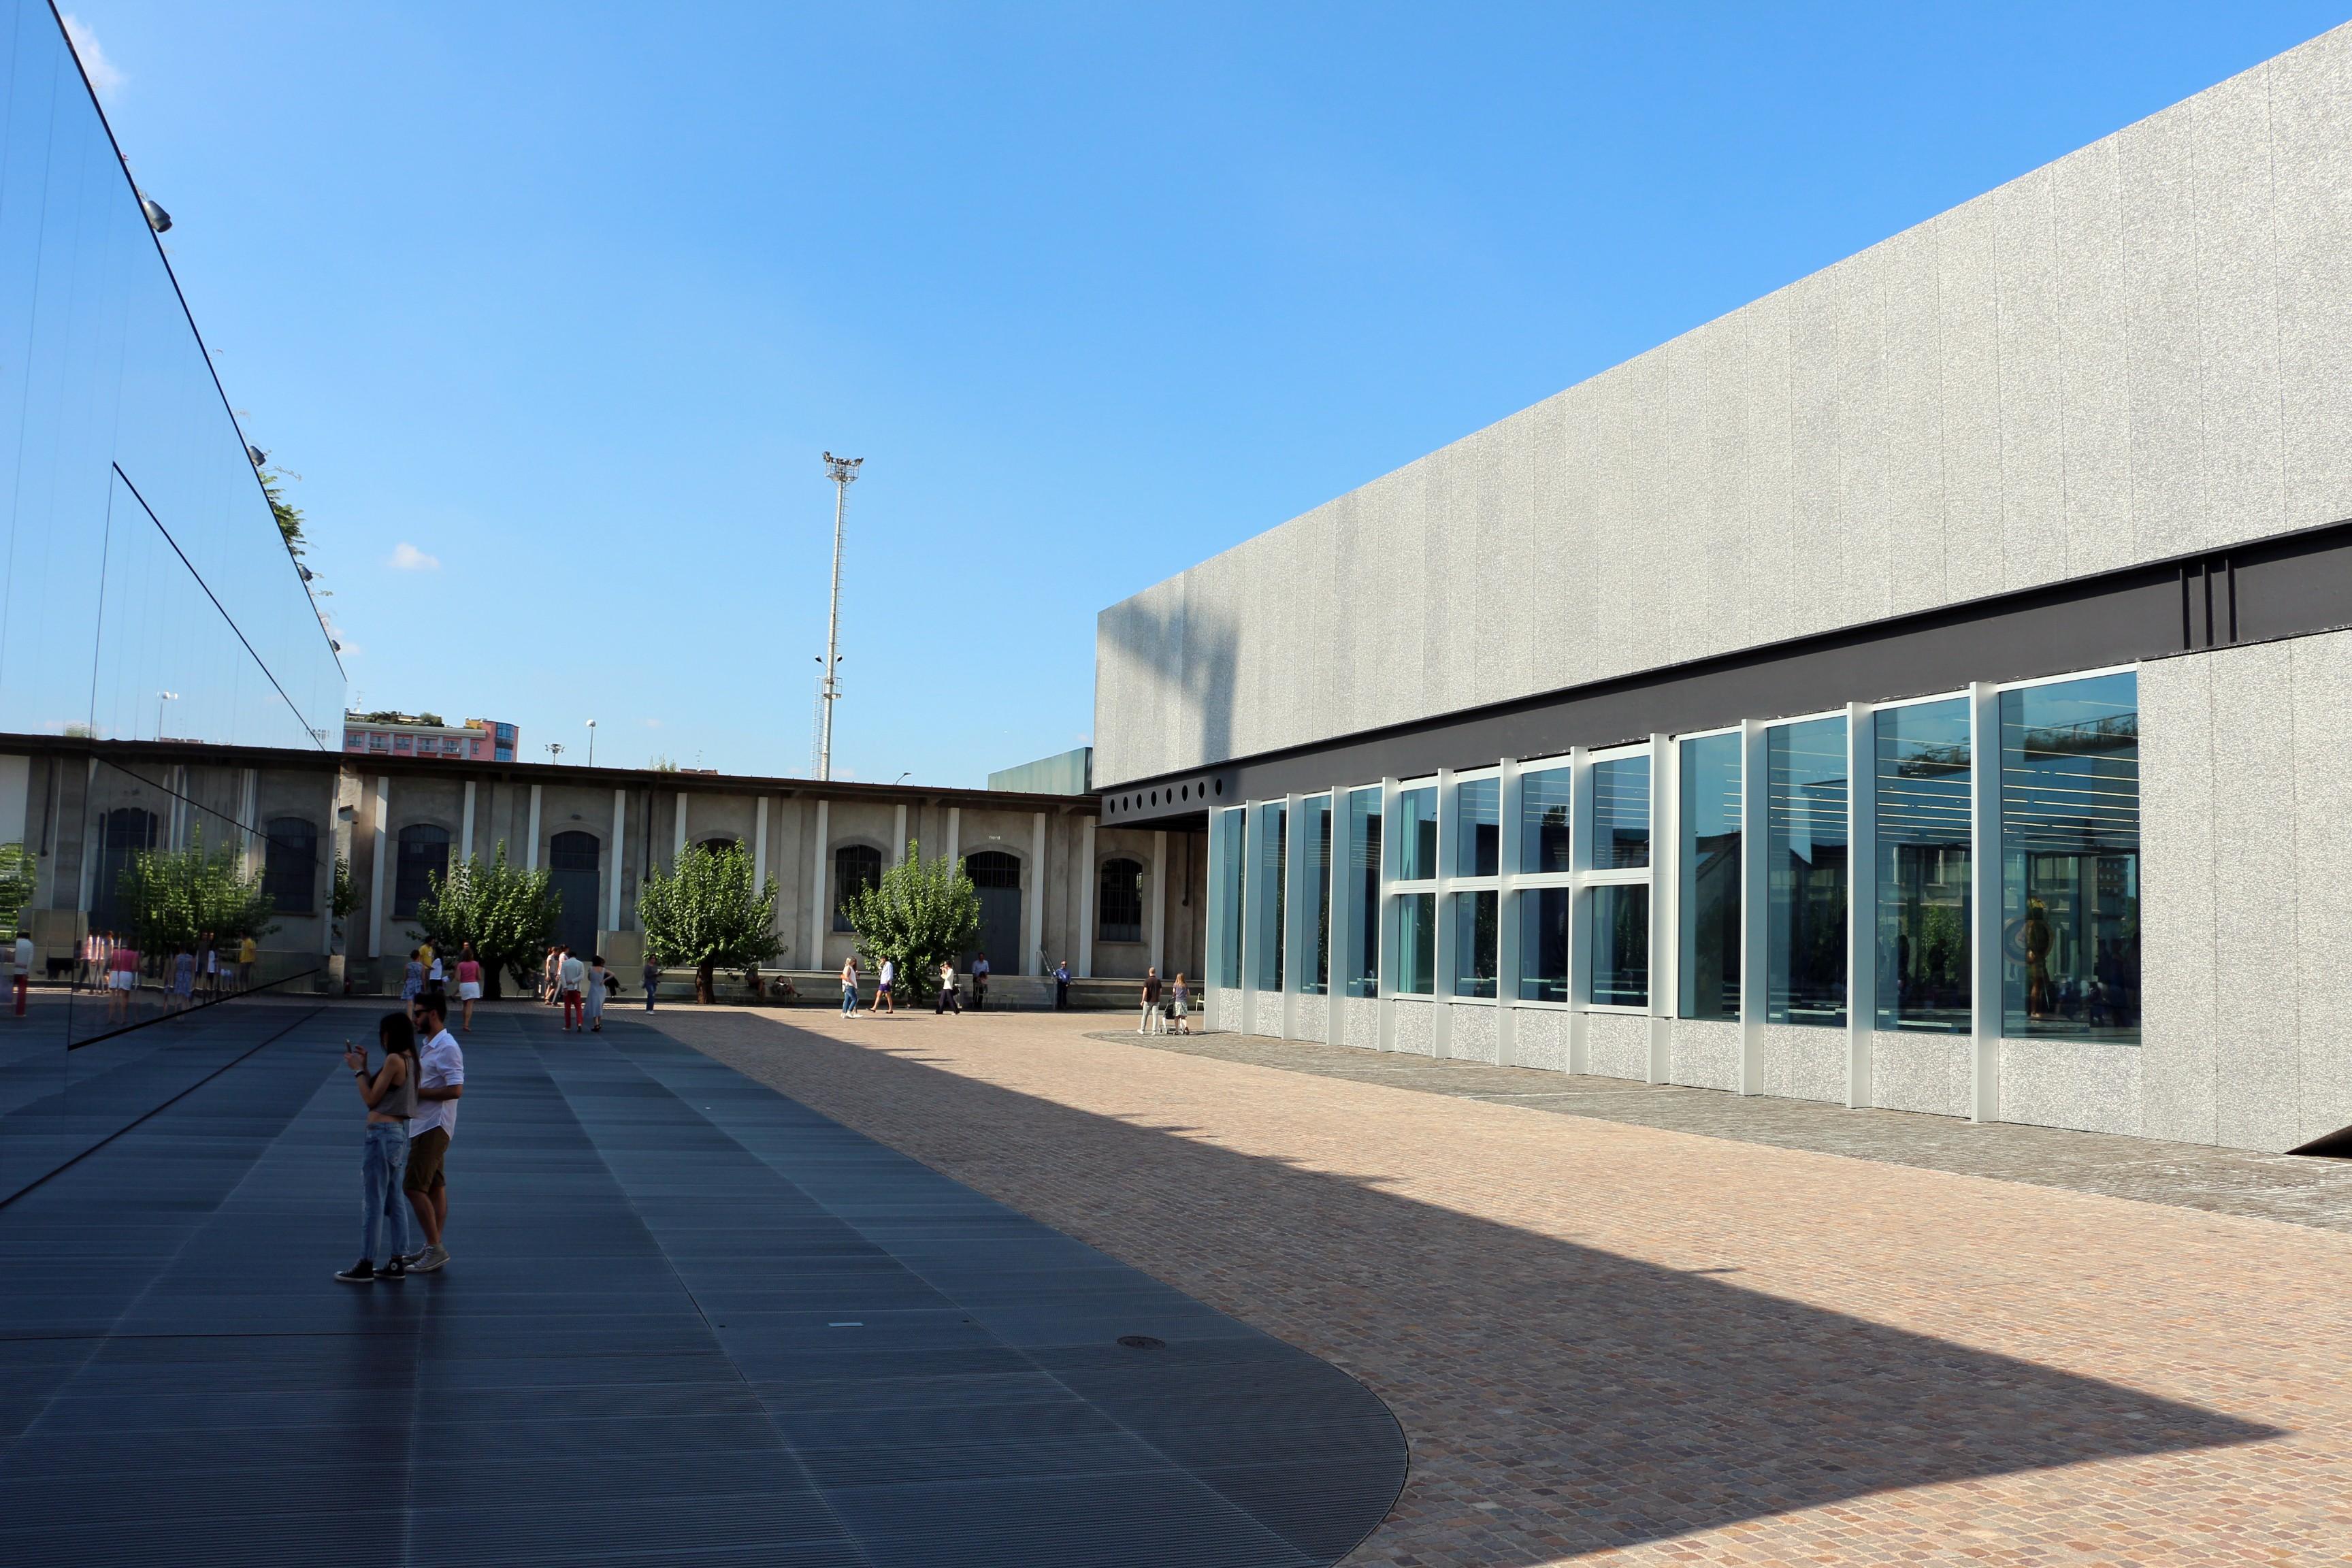 Fondazione prada museum milan all year for Fondation prada milan